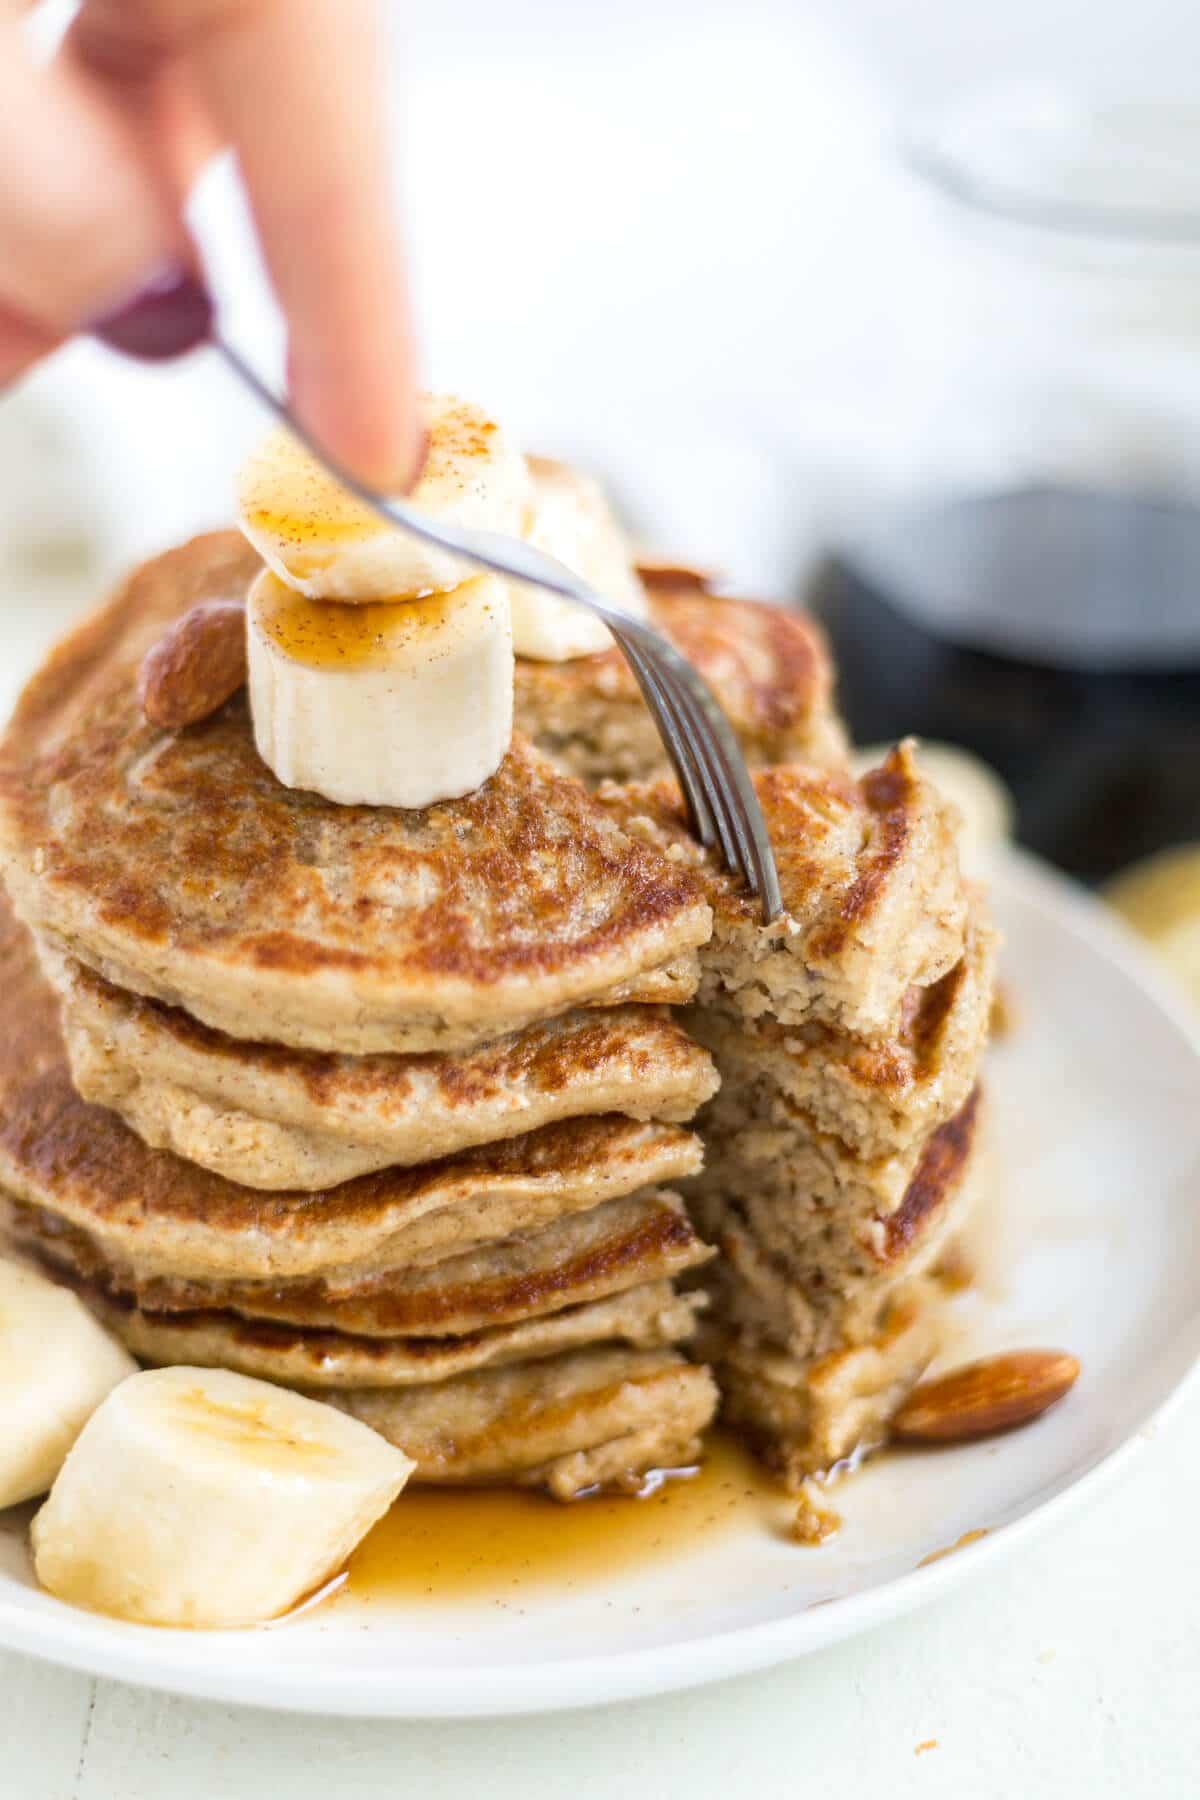 banana and oatmeal pancakes